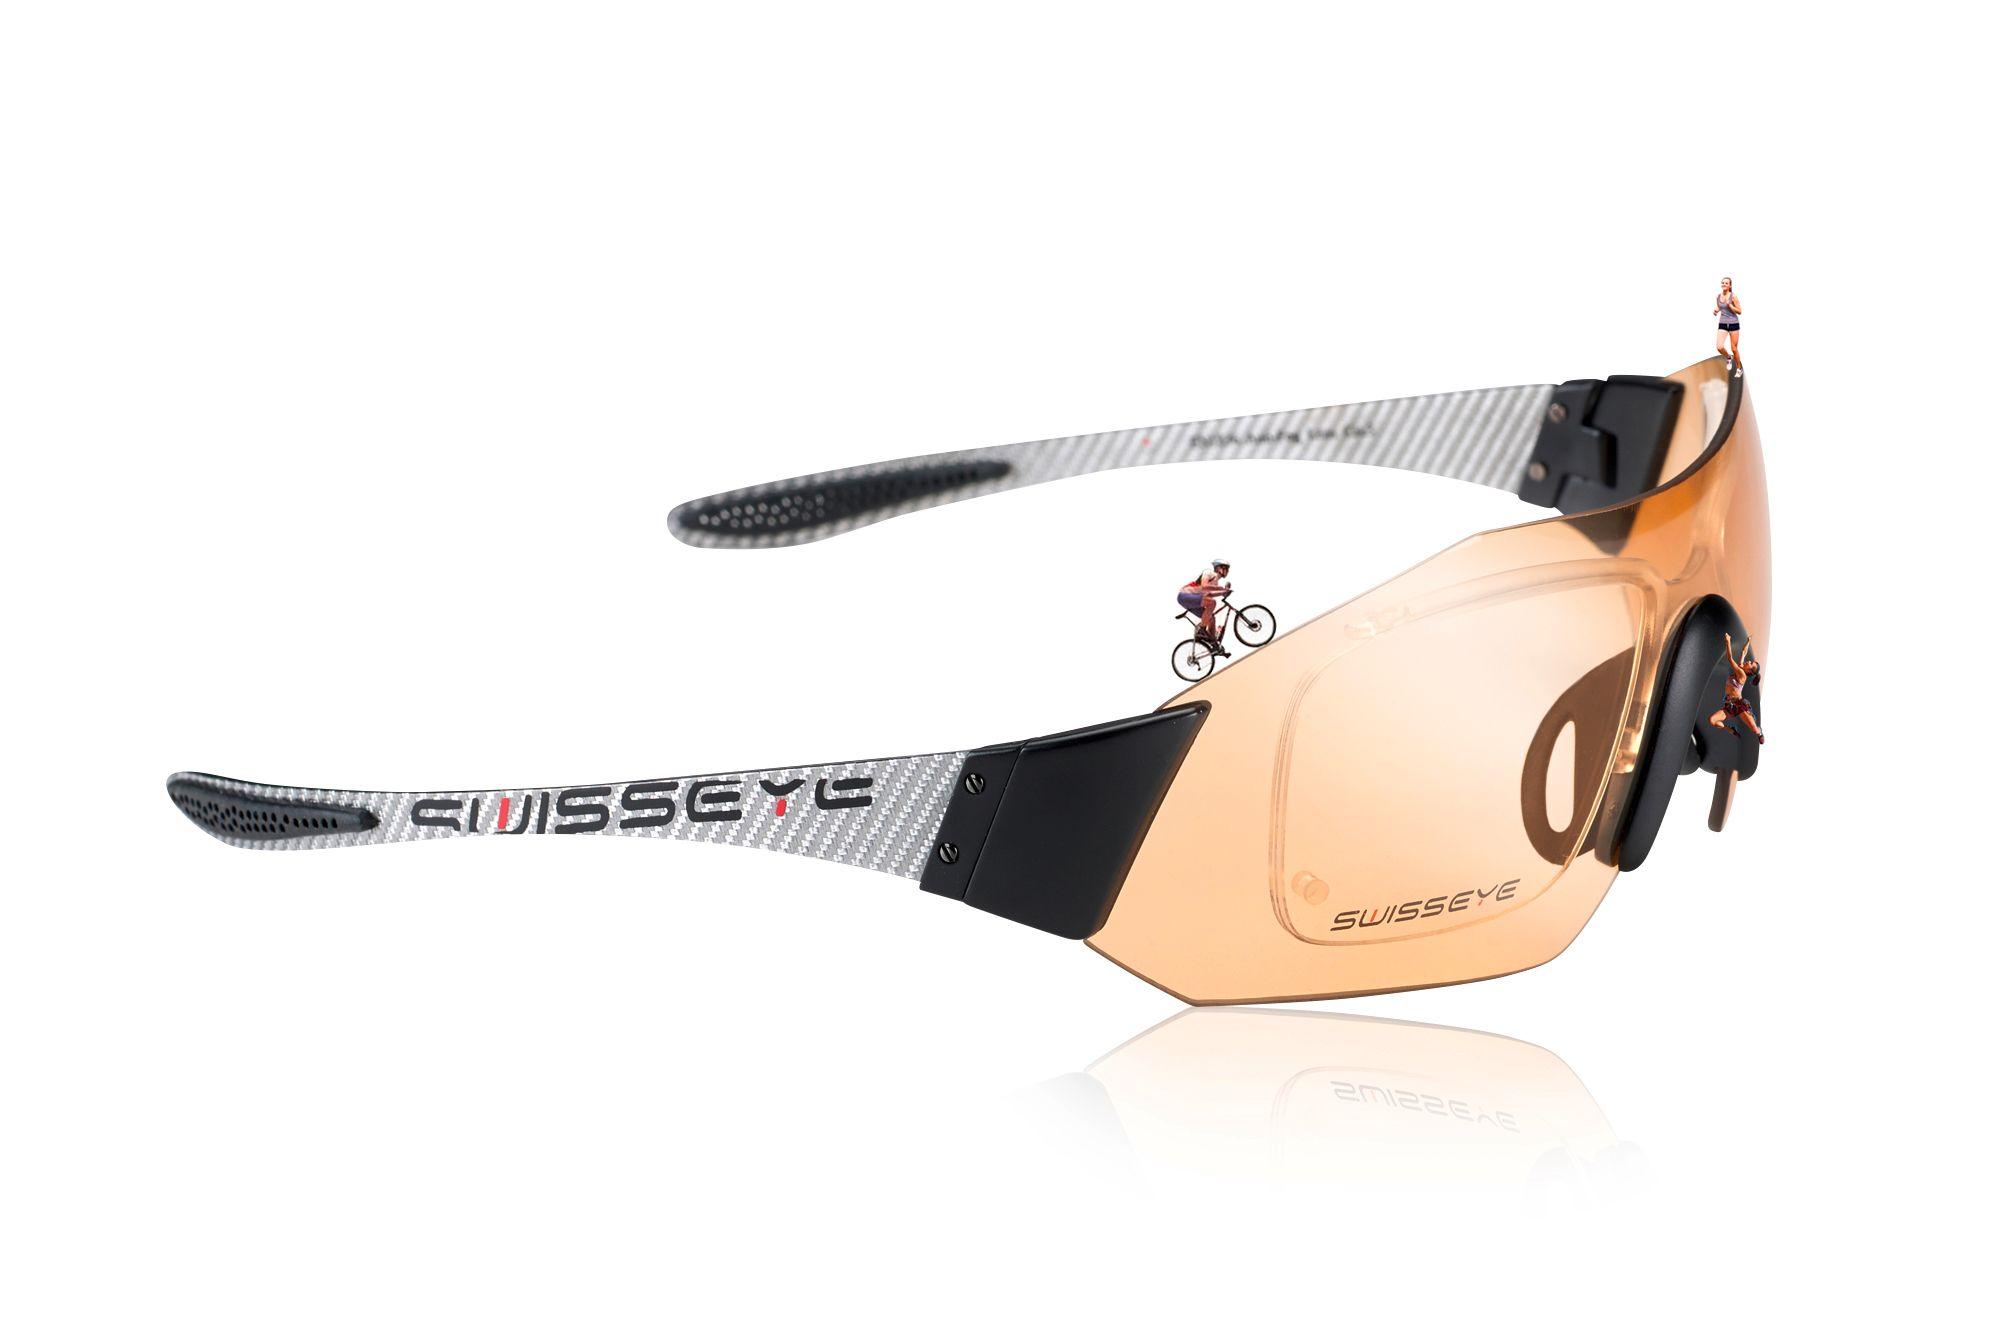 Sportbrillen in Sehstärke bieten bezahlbaren Schutz